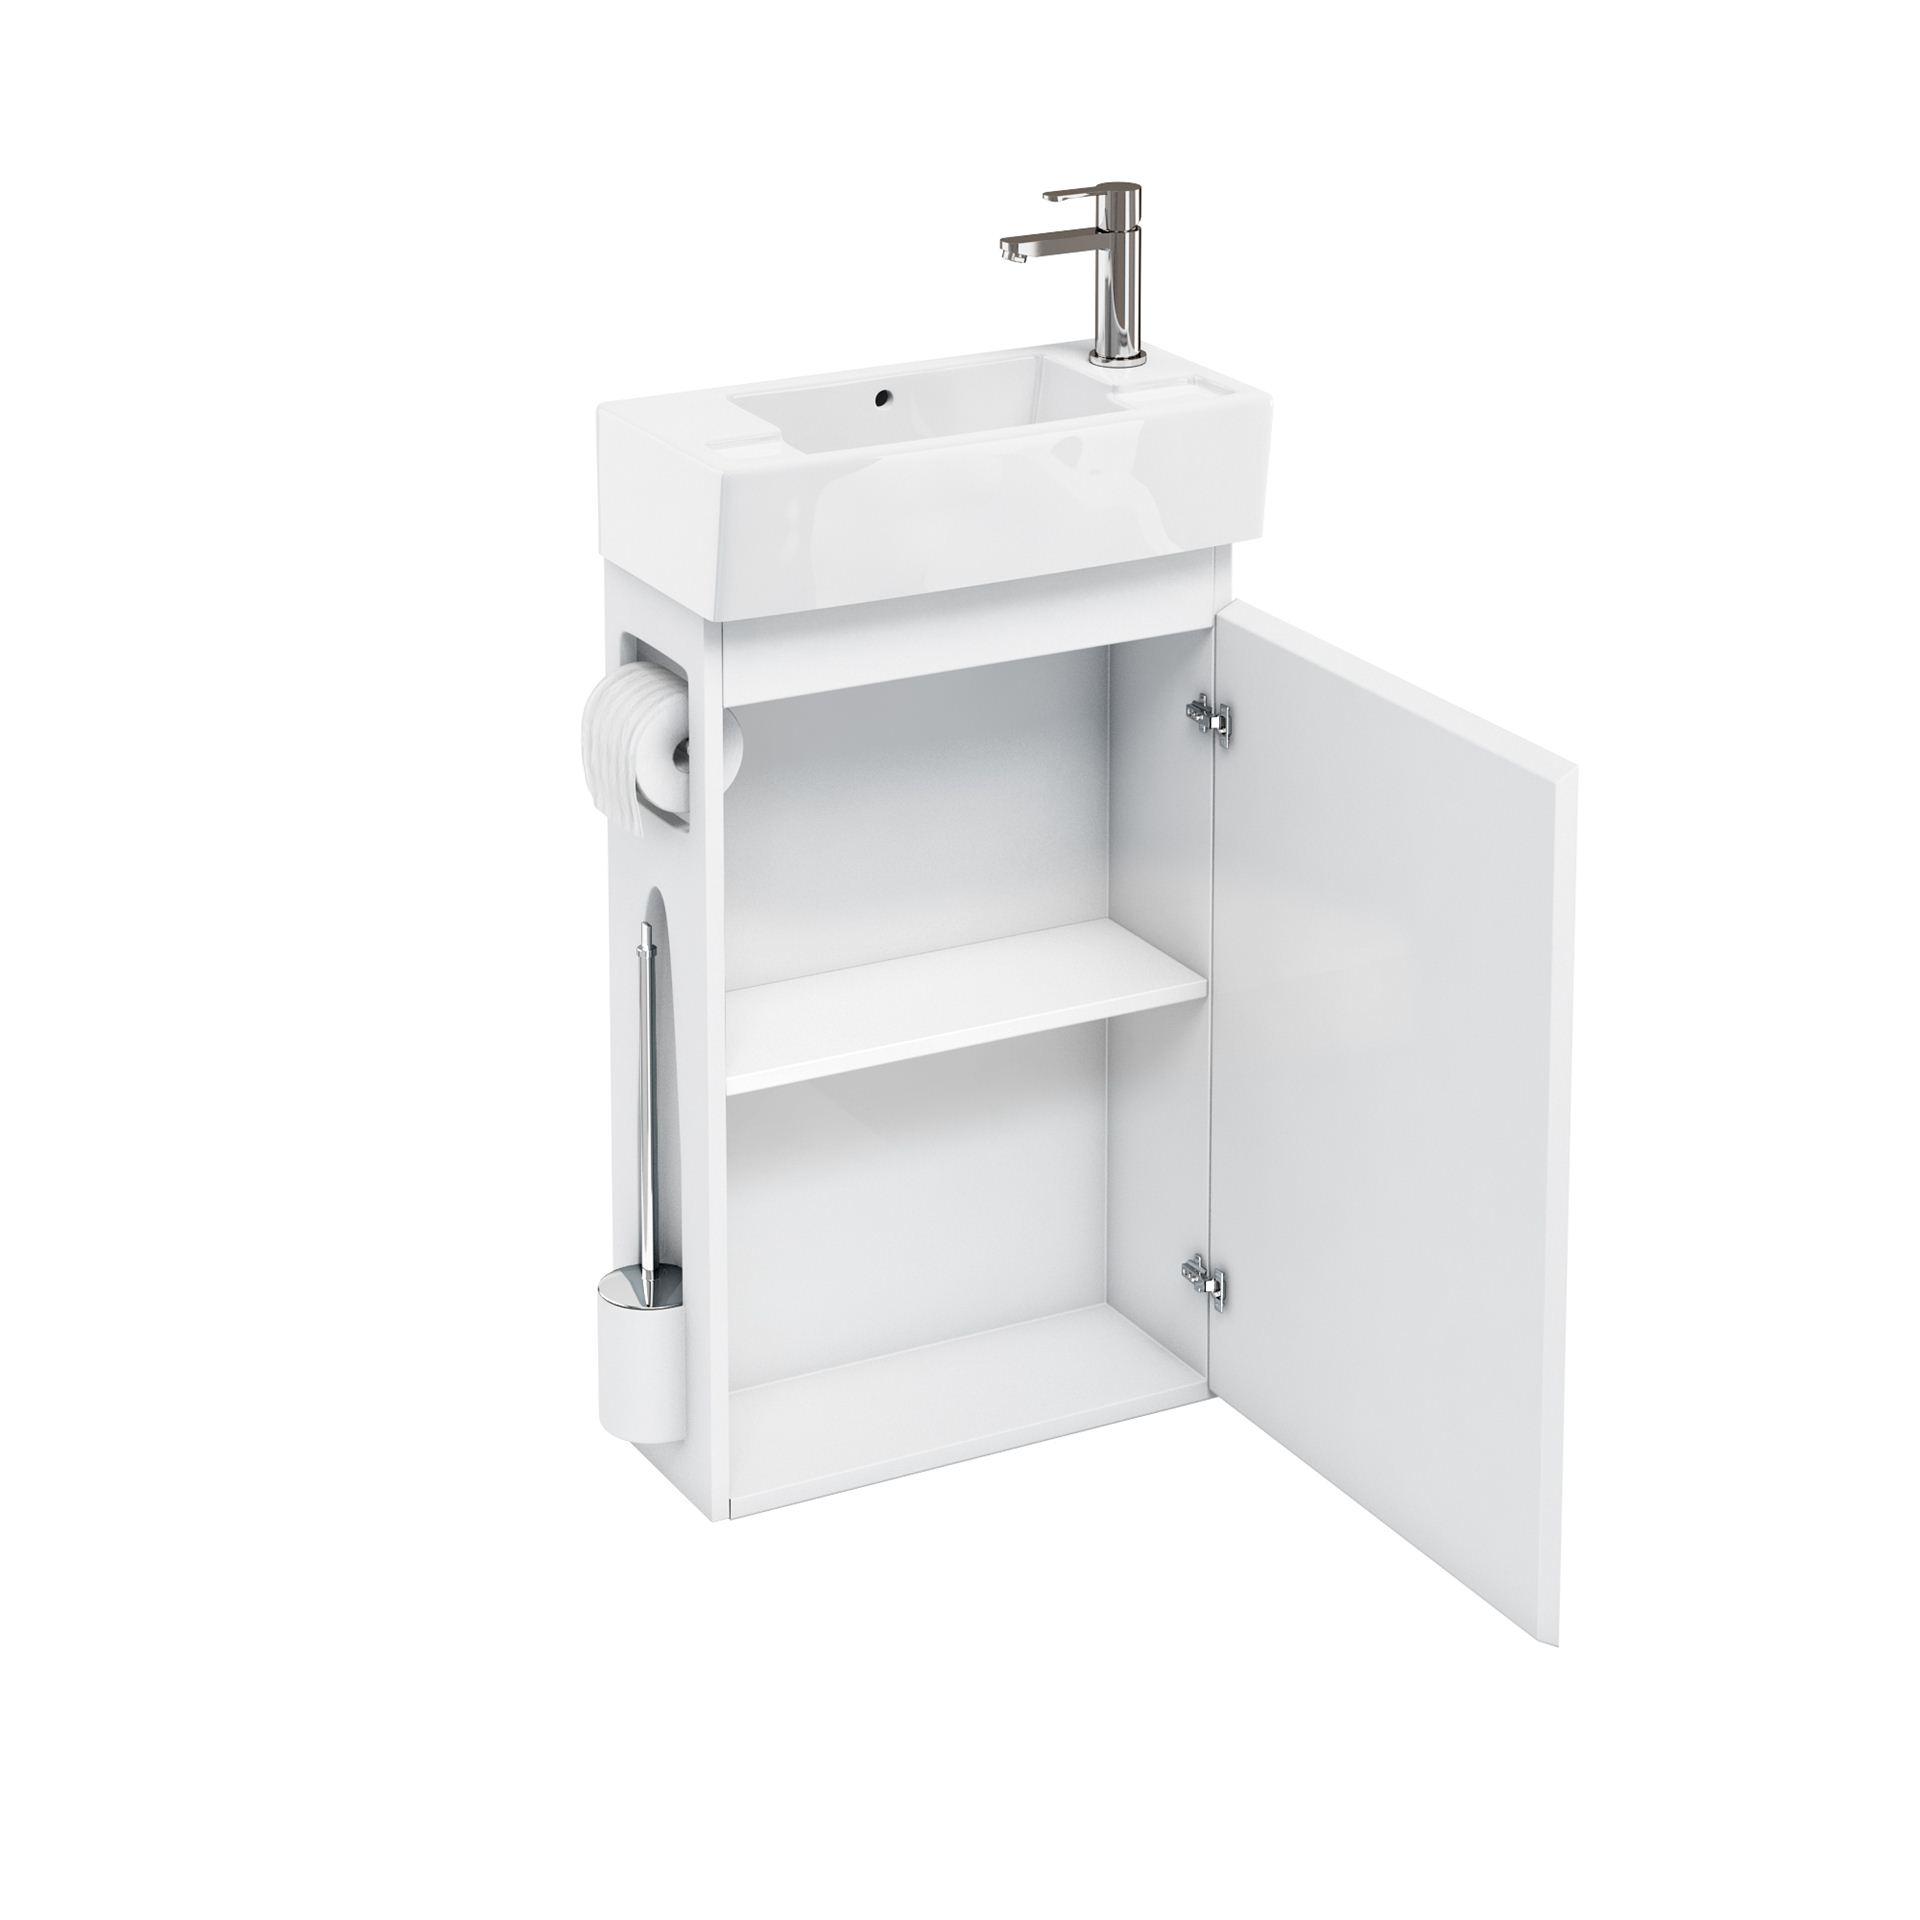 aqua all in one floor standing unit and cloakroom basin. Black Bedroom Furniture Sets. Home Design Ideas